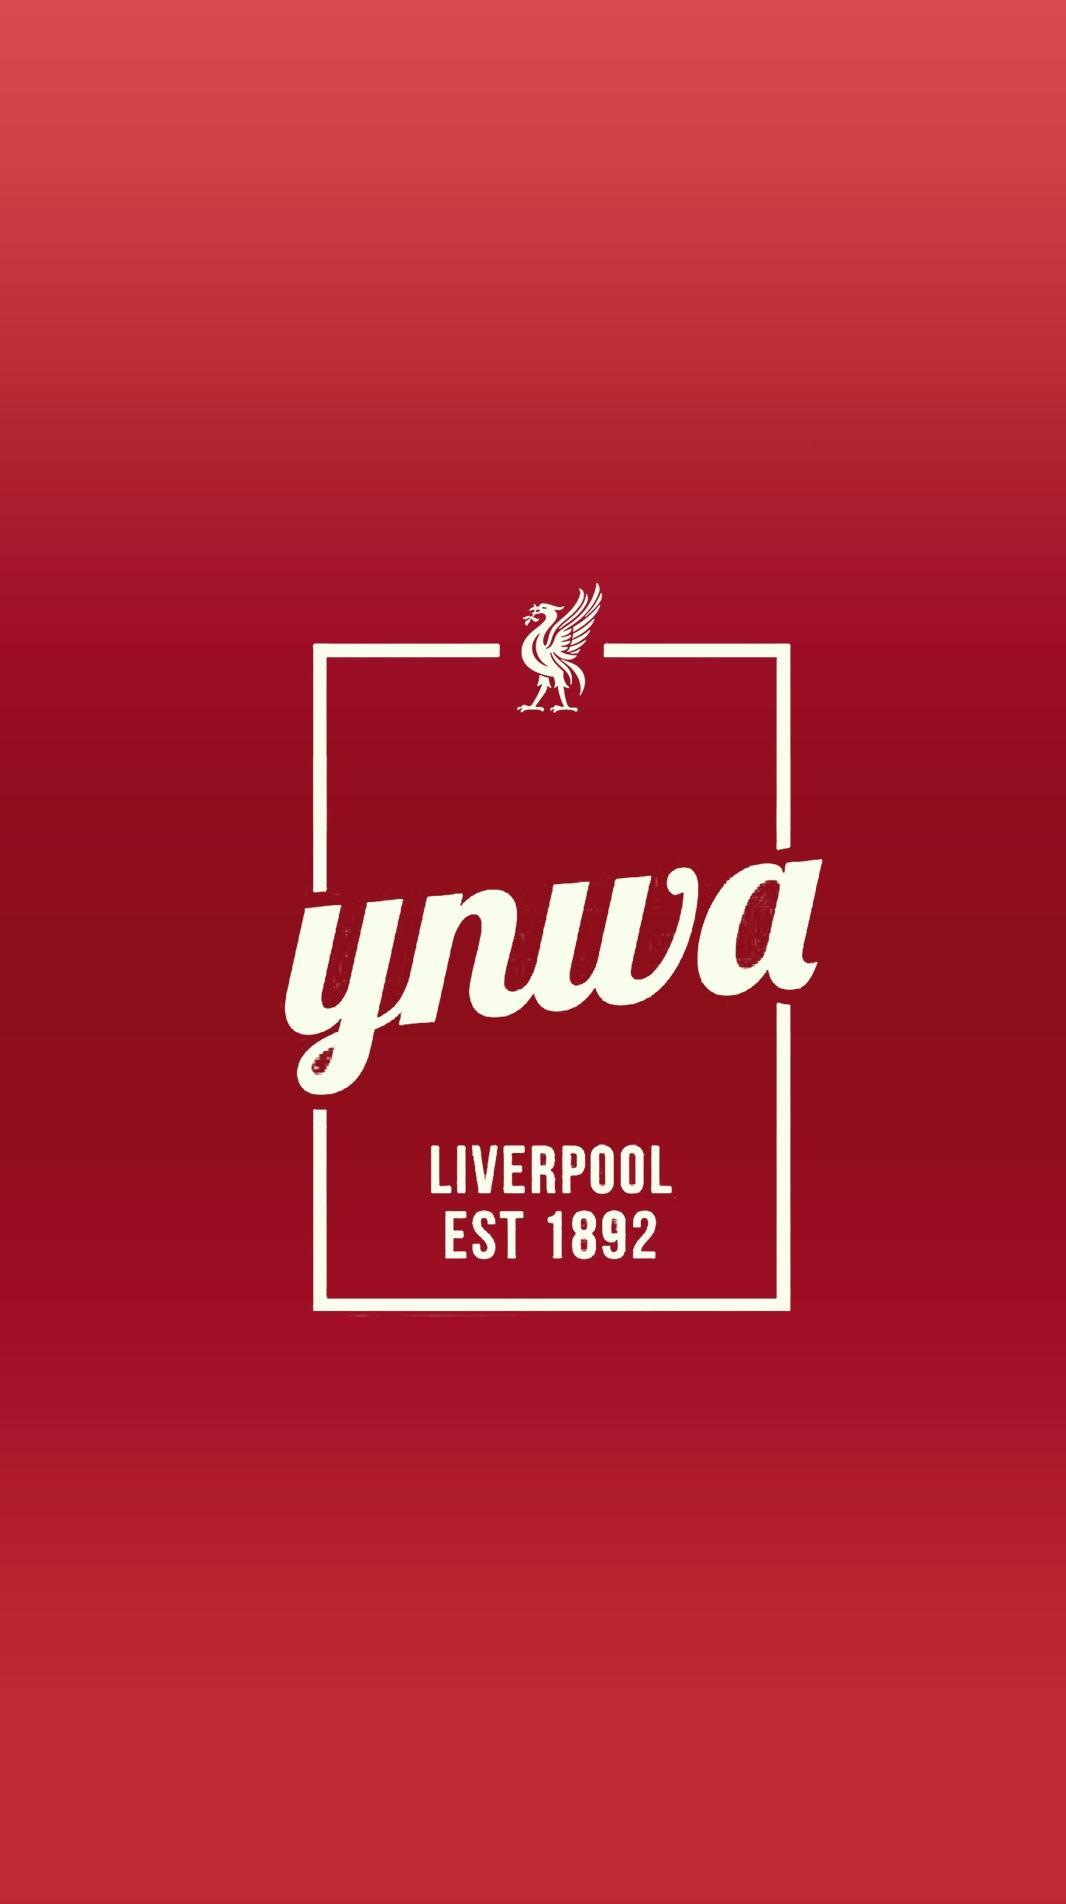 Liverpool Wallpaper Hd 2020 - Hd Football